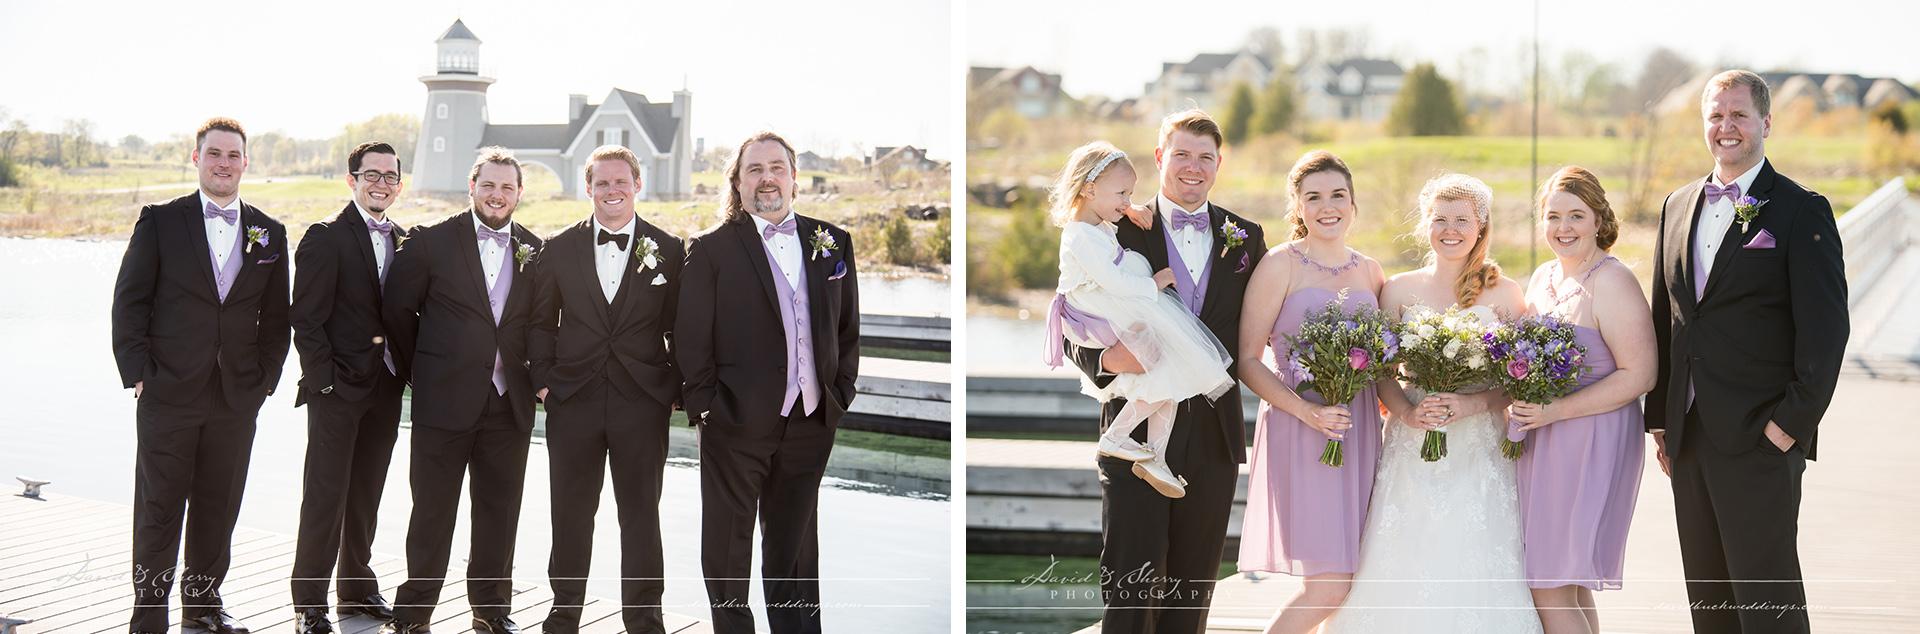 Cobble_Beach_Wedding_Photography_23